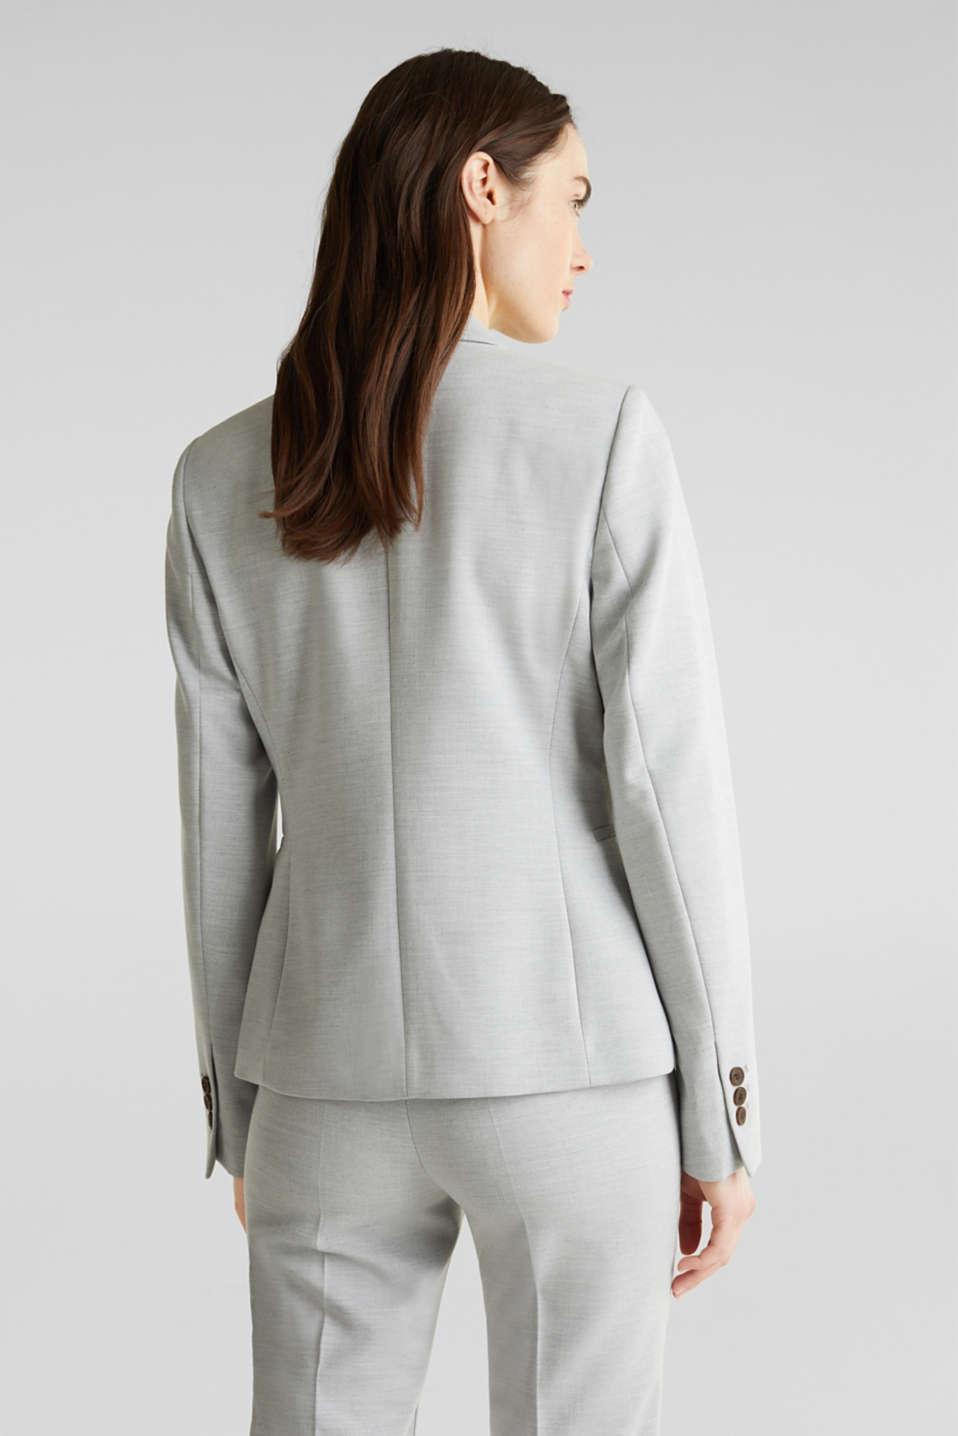 SUMMER BIZ mix + match stretch blazer, LIGHT GREY 5, detail image number 3